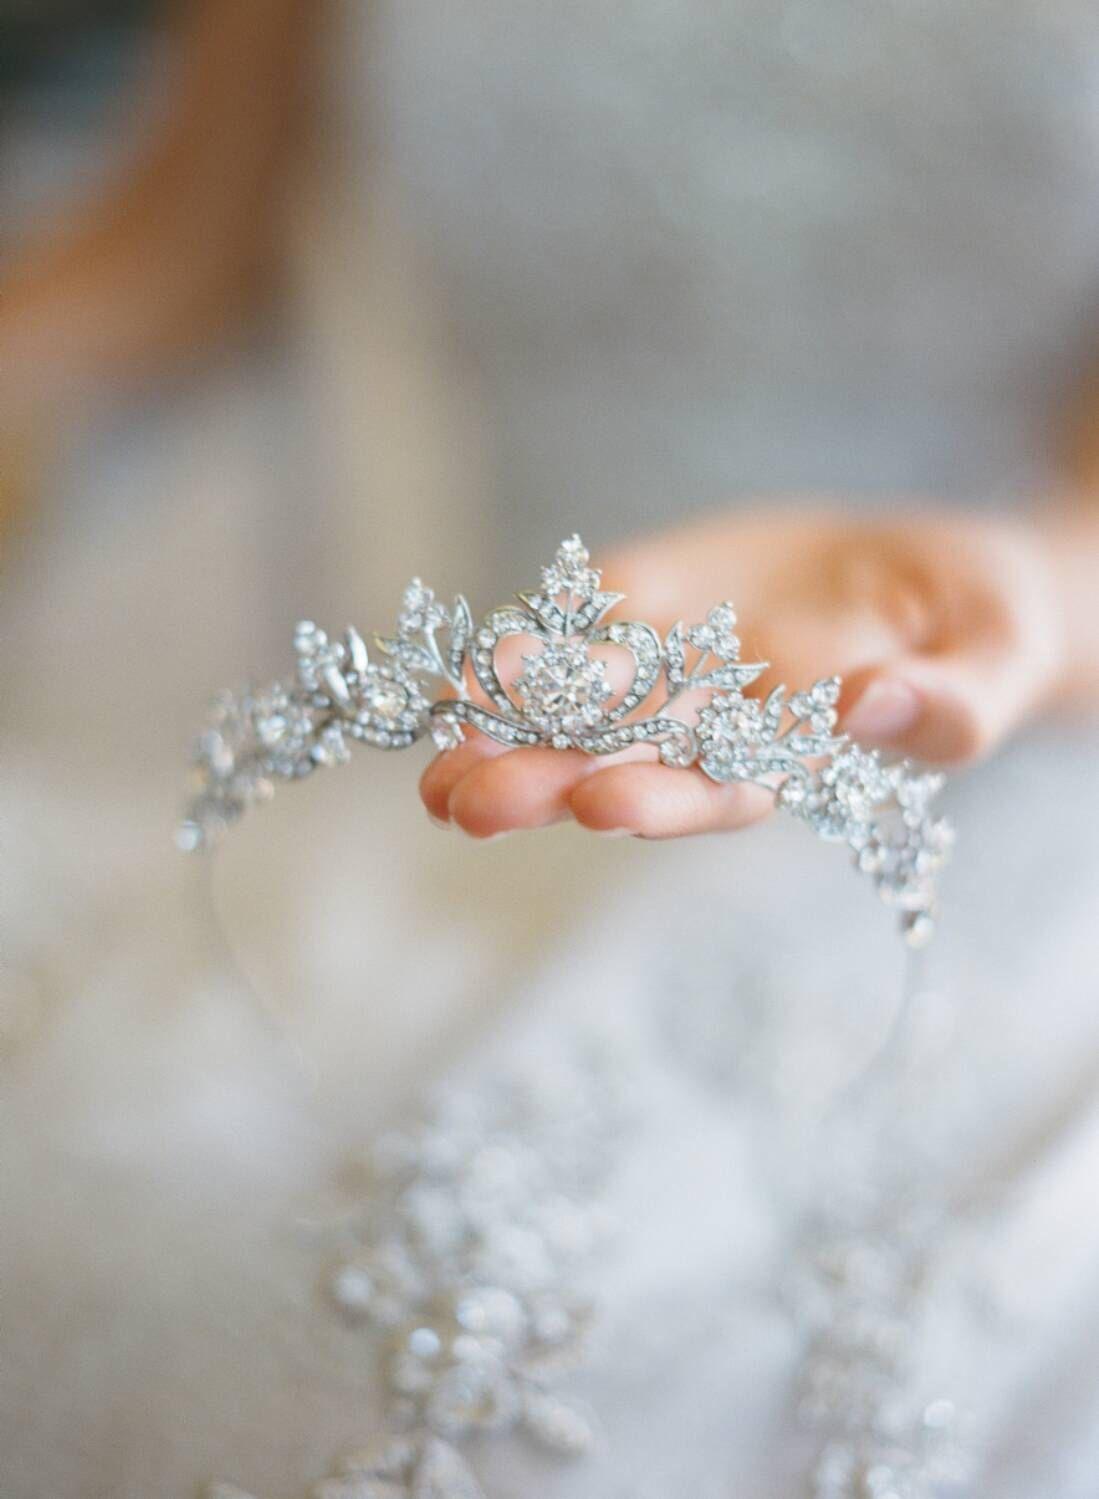 Crowns full circle round tiaras rhinestones crystal wedding bridal - Bridal Tiara Crystal Heart Tiara Diana Swarovski Bridal Tiara Crystal Wedding Crown